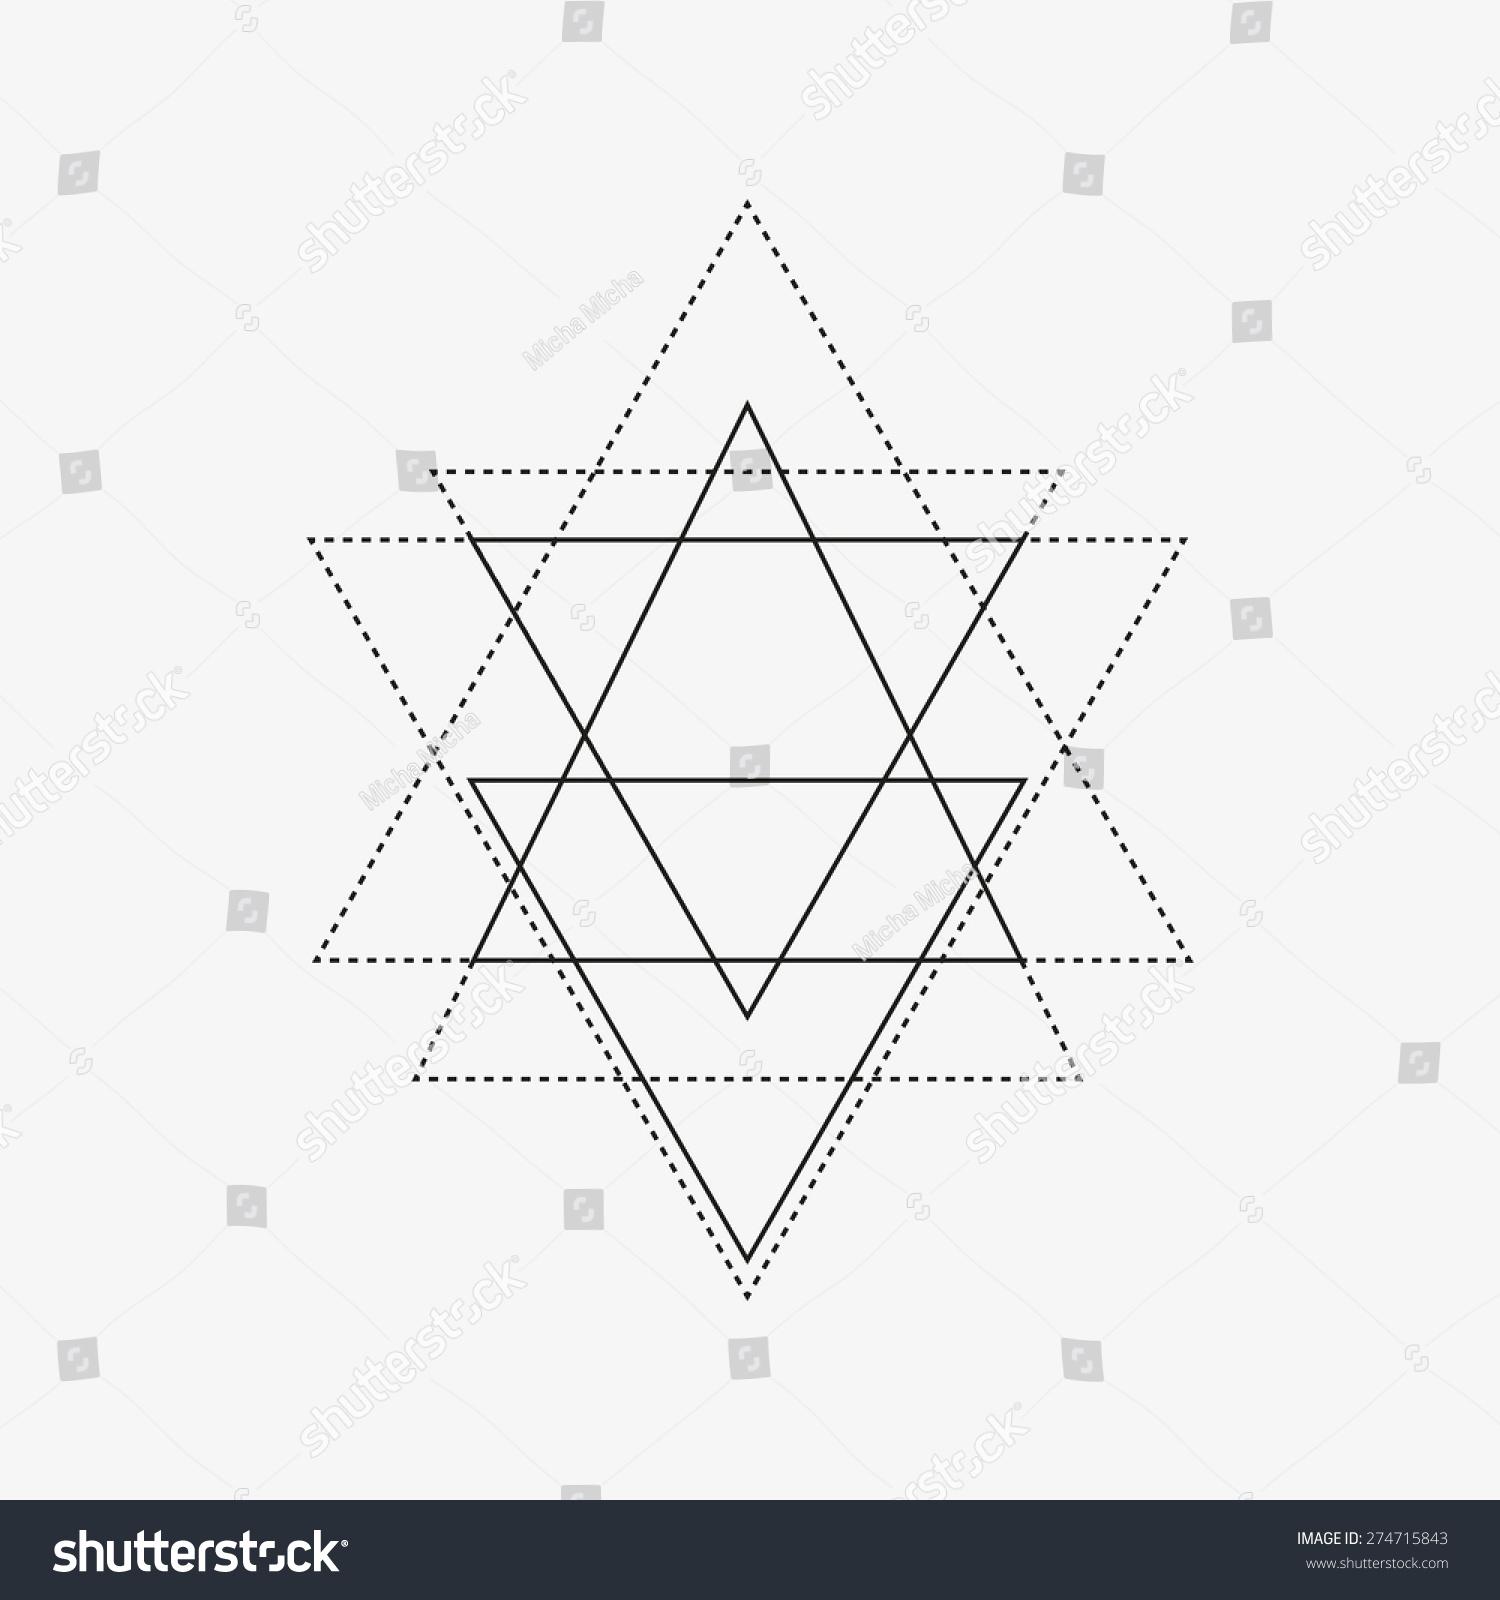 Line And Shape Design : Geometric shape triangle polygonal line art stock vector